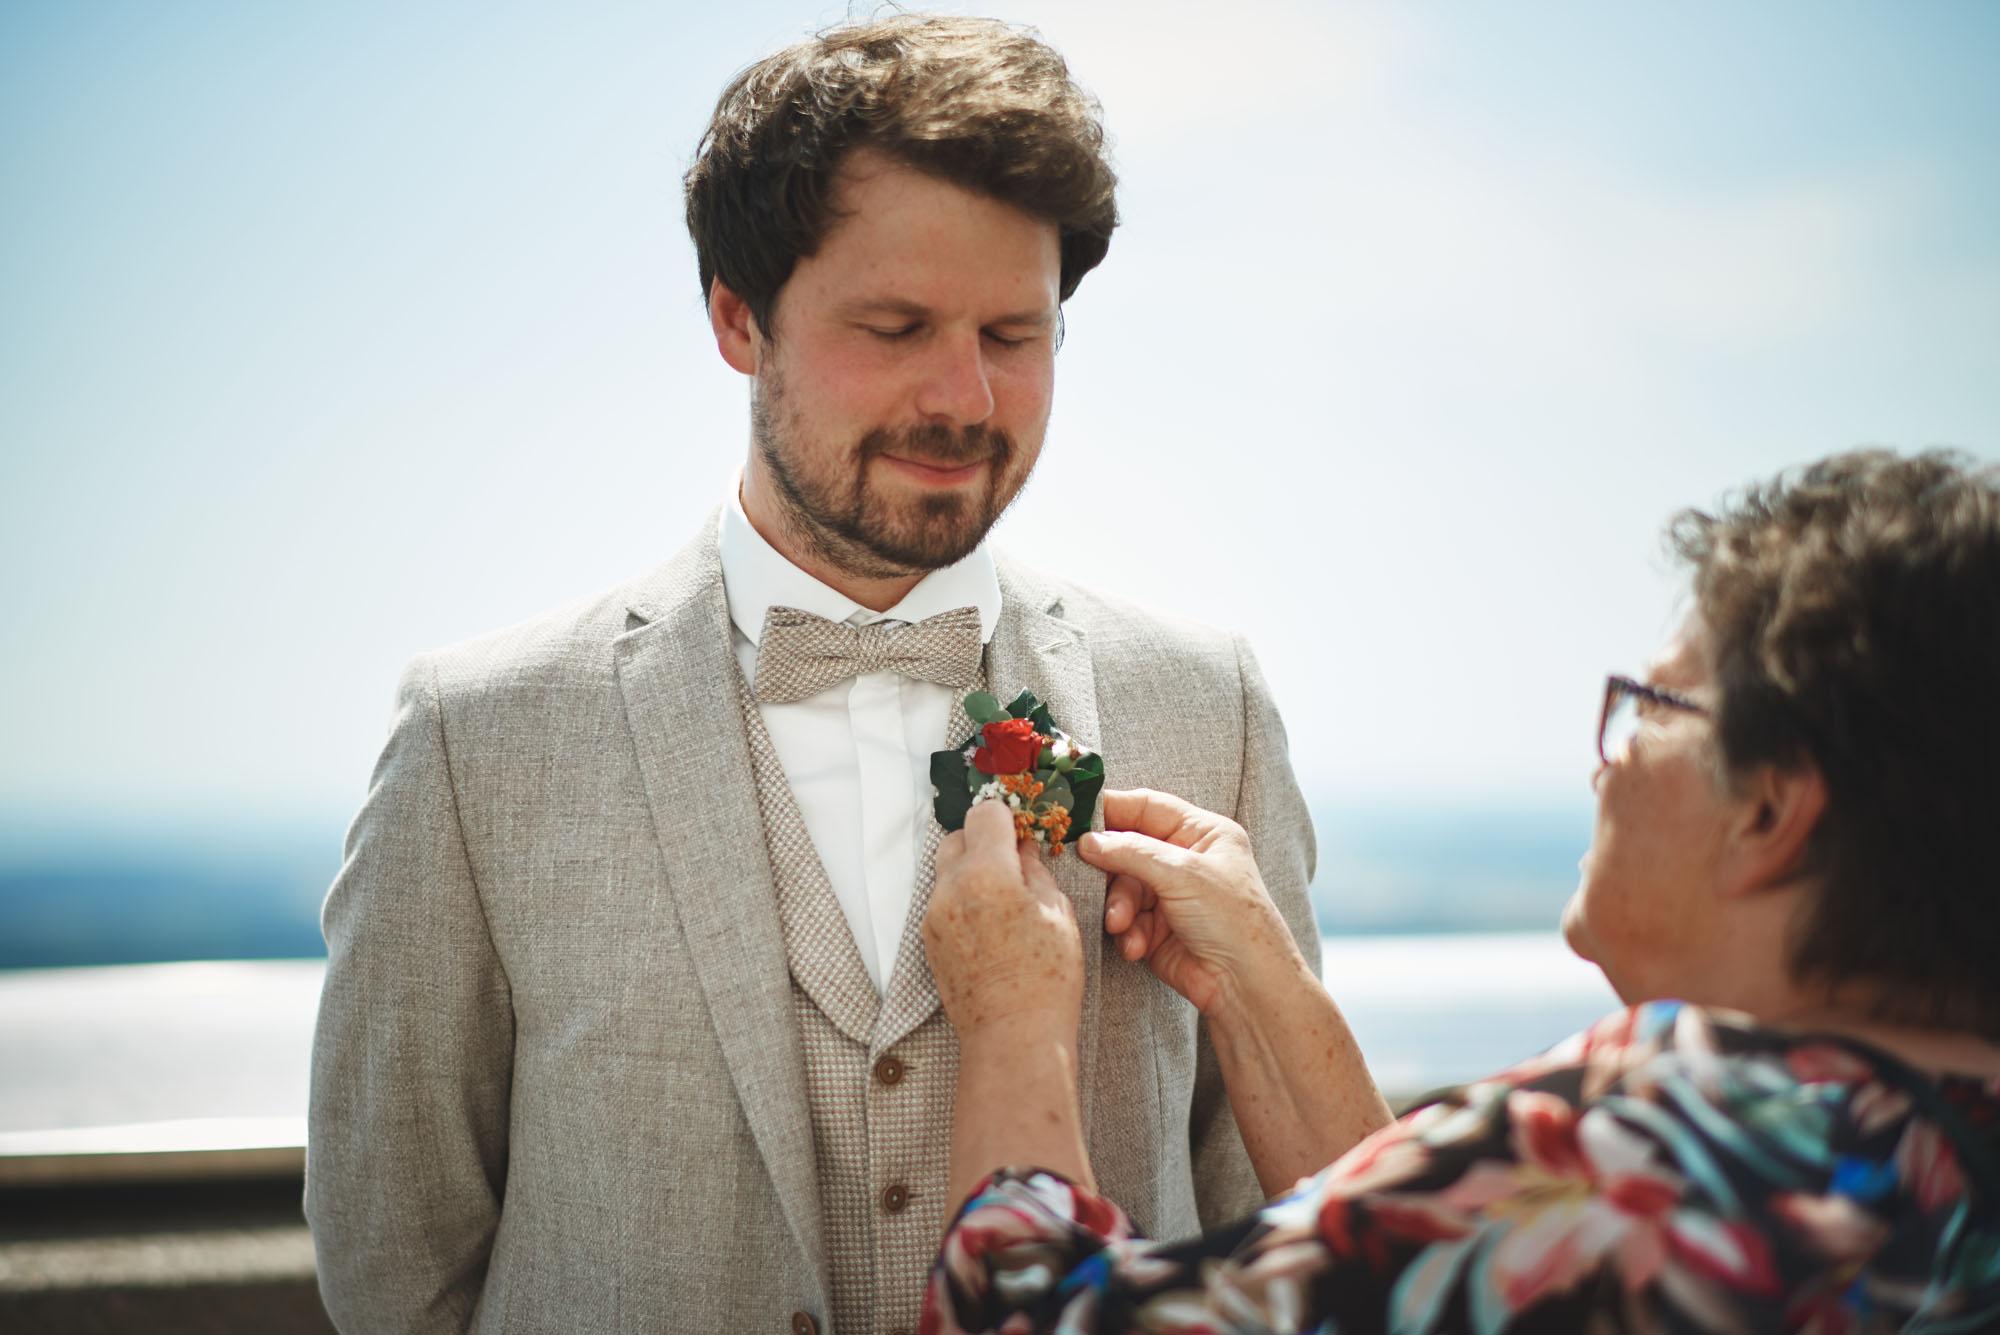 Martin Spoerl Potography Hochzeit Ailinger Muehle 0011